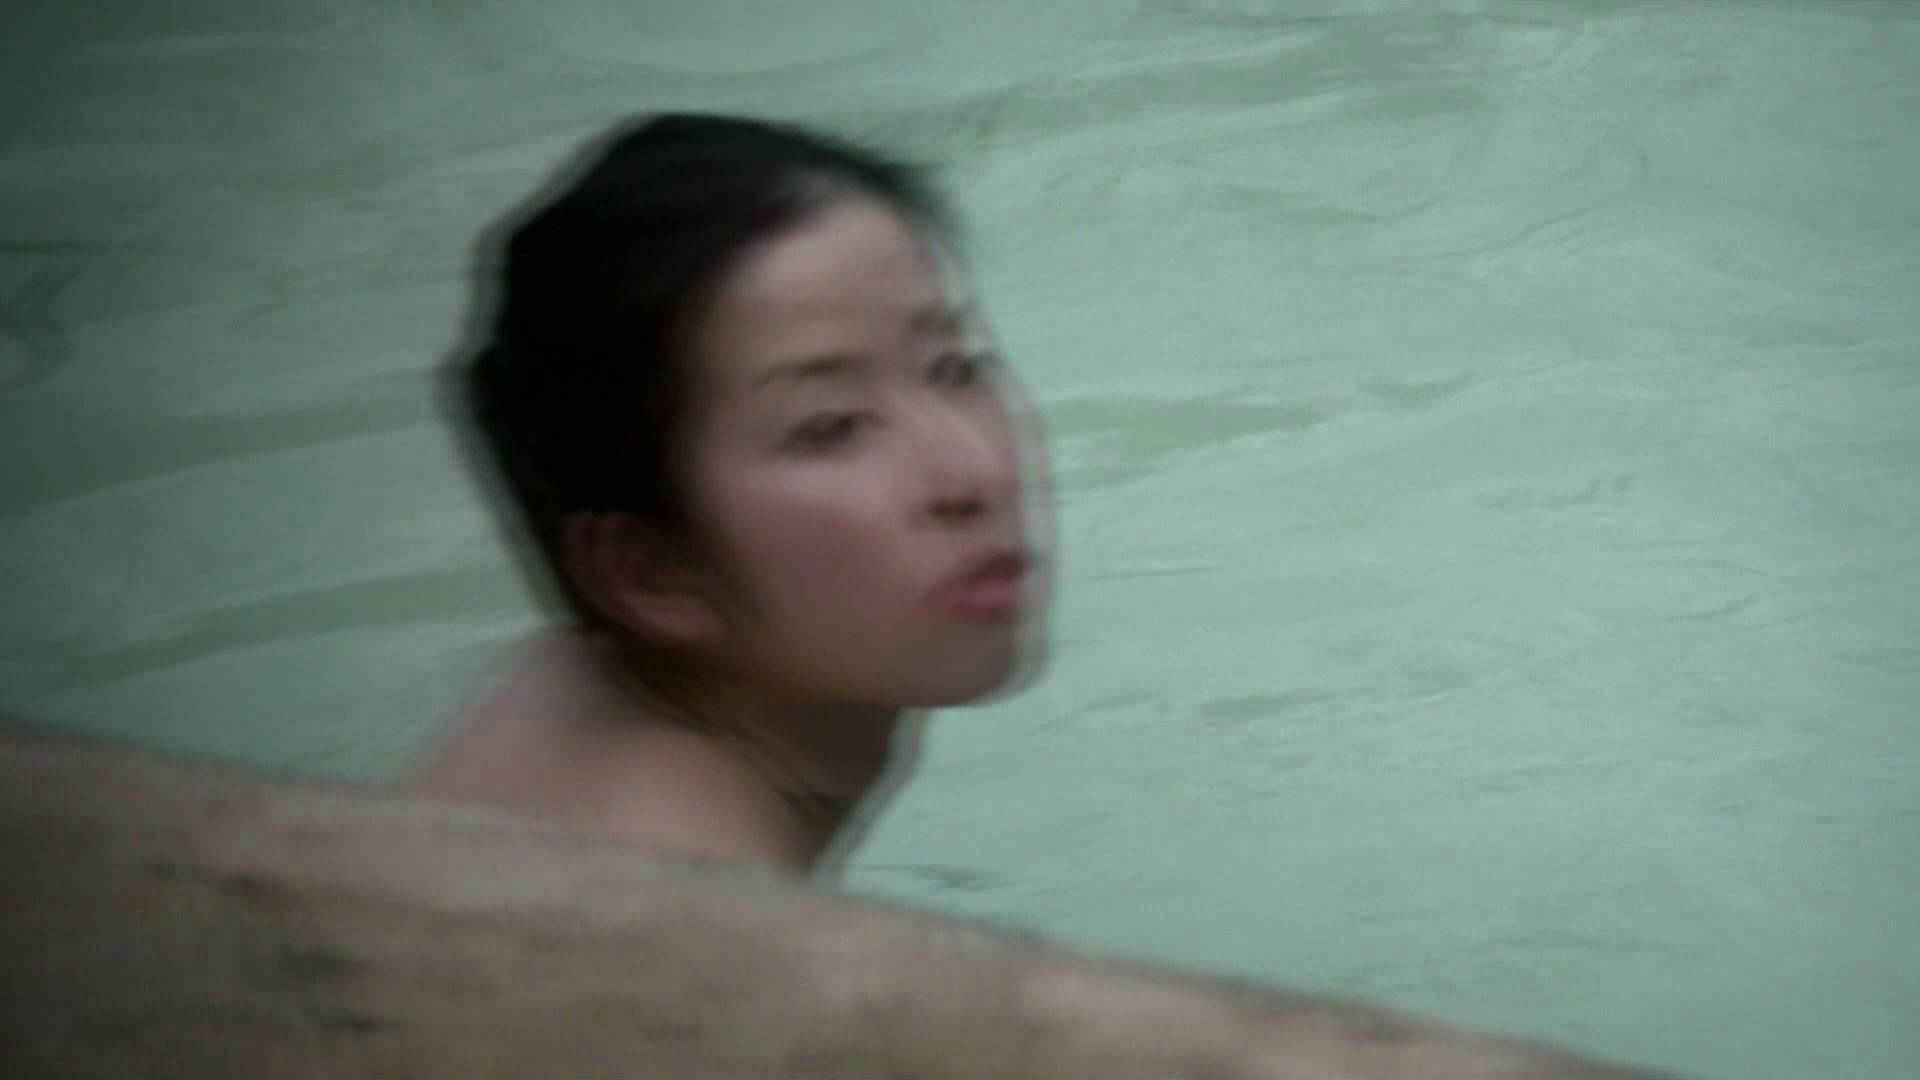 Aquaな露天風呂Vol.656 OLセックス   露天  72画像 25